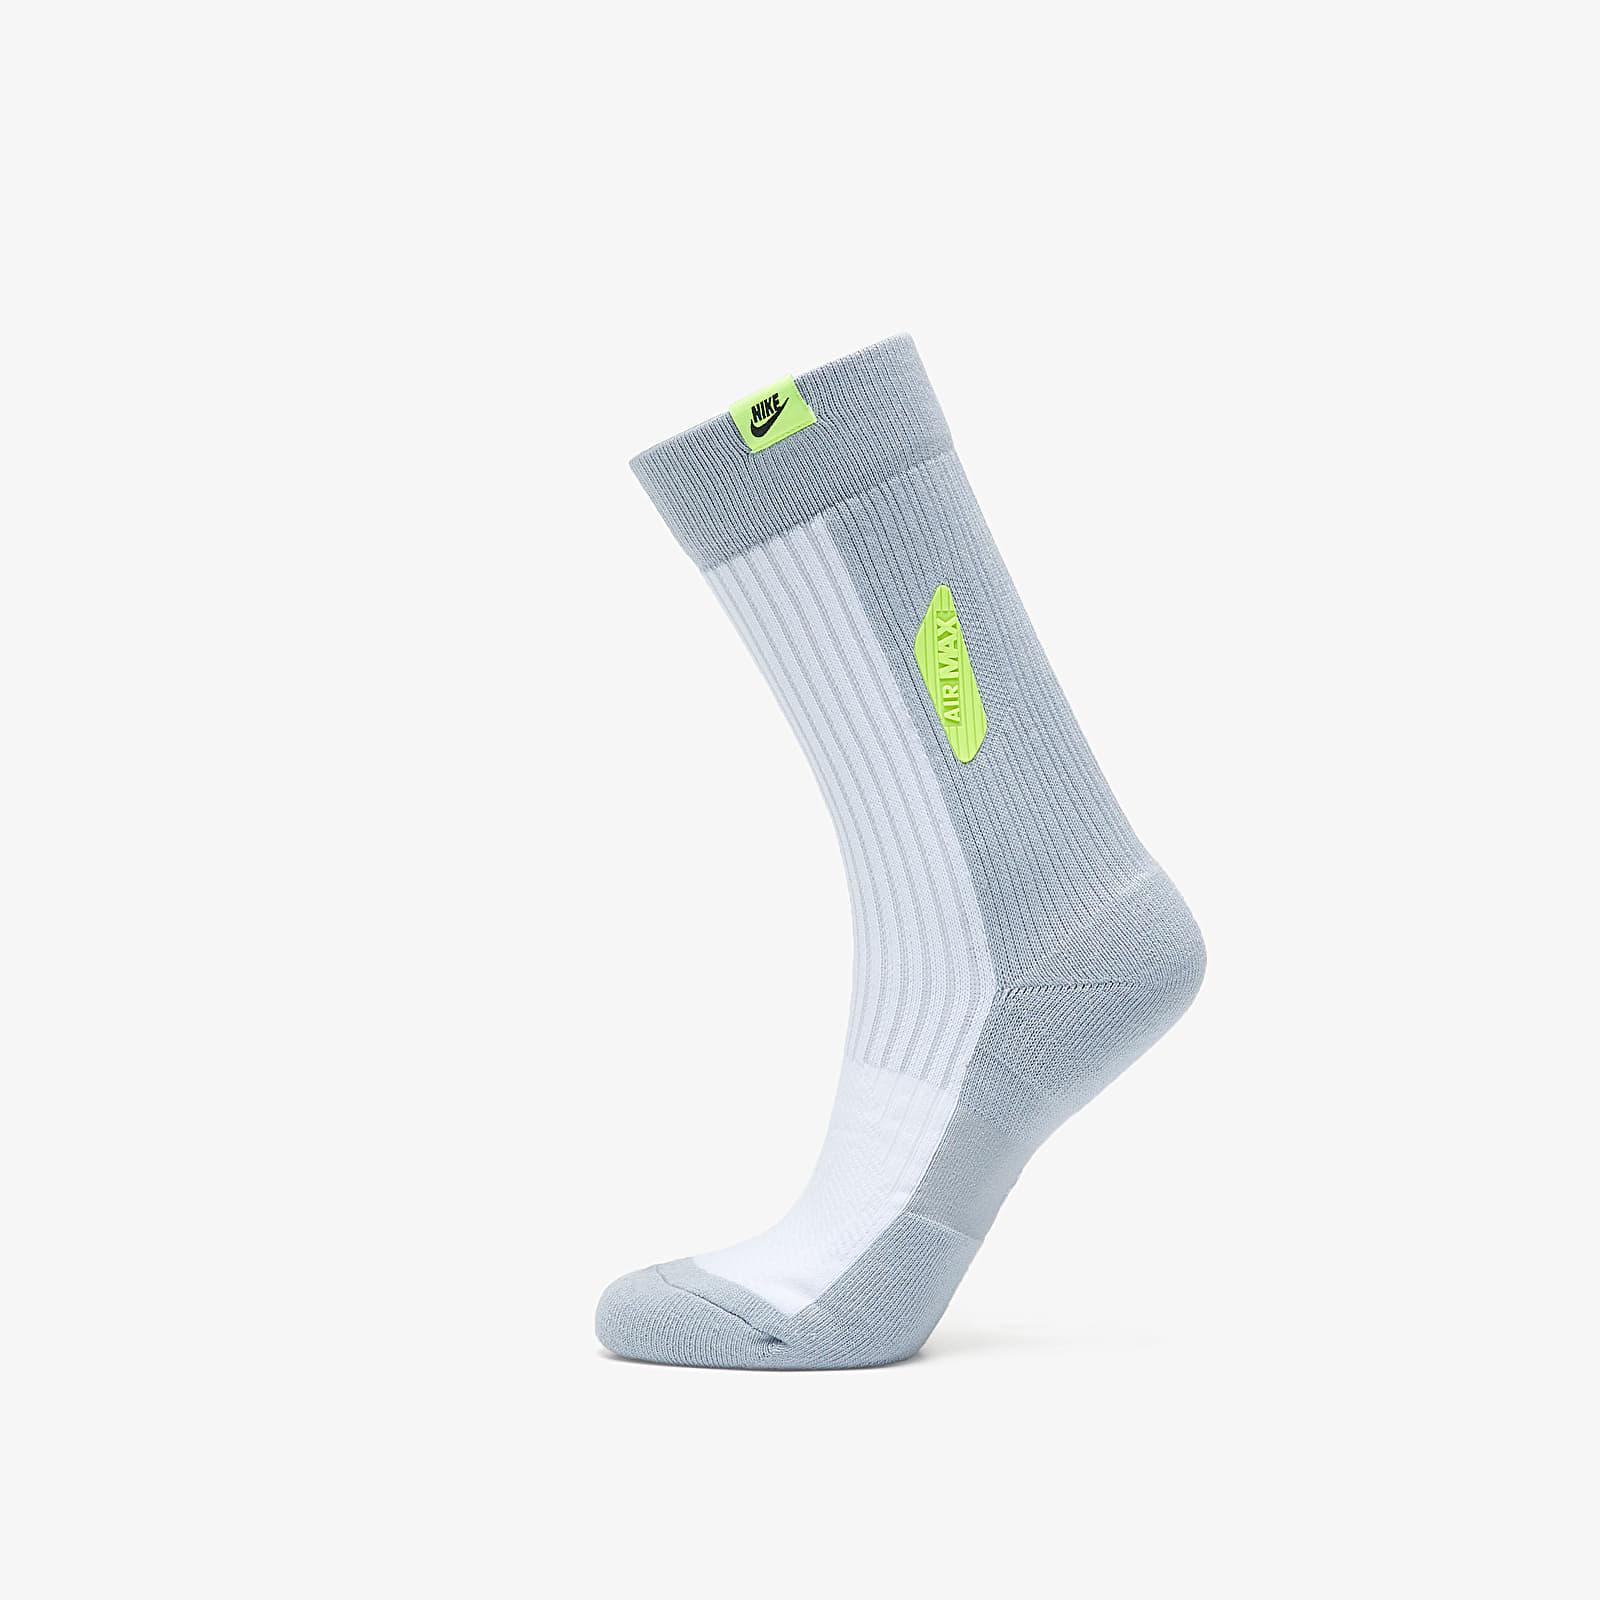 Ponožky Nike Sneaker Air Max 90 Crew Sox White/ VoLight/ Black